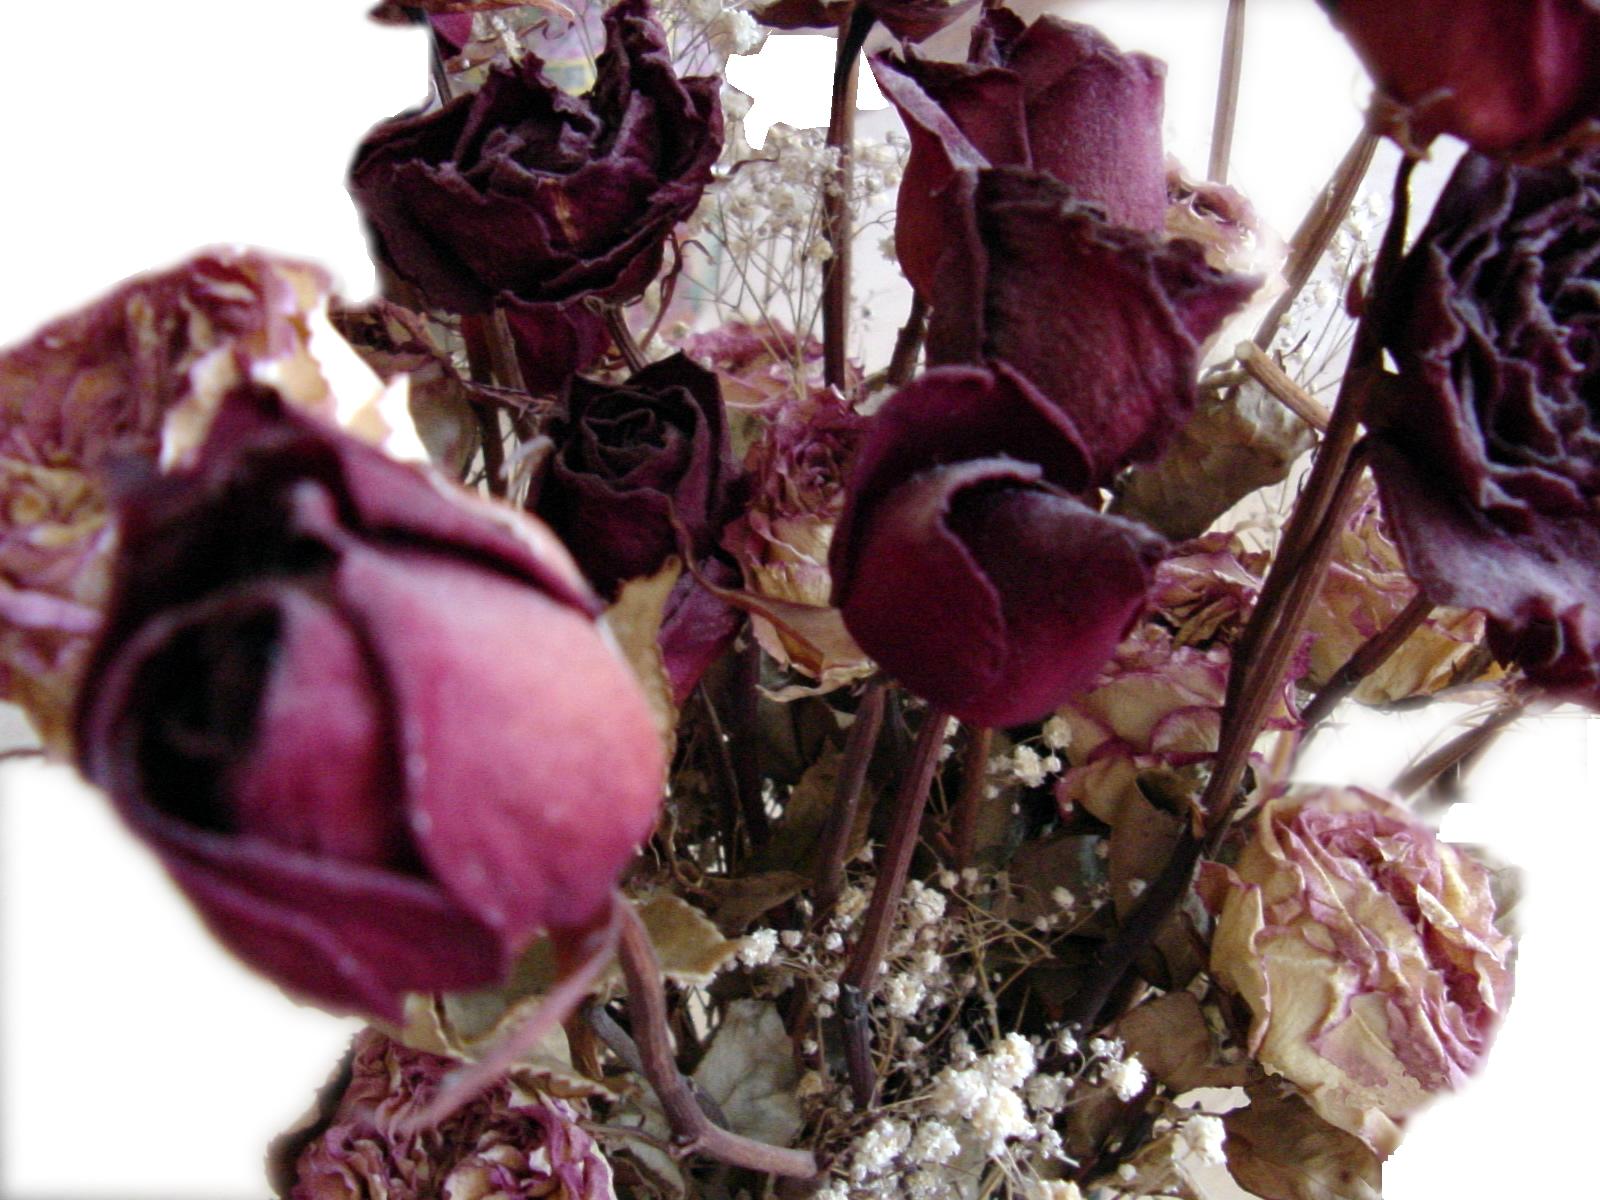 The best flowers for dried flower arrangements